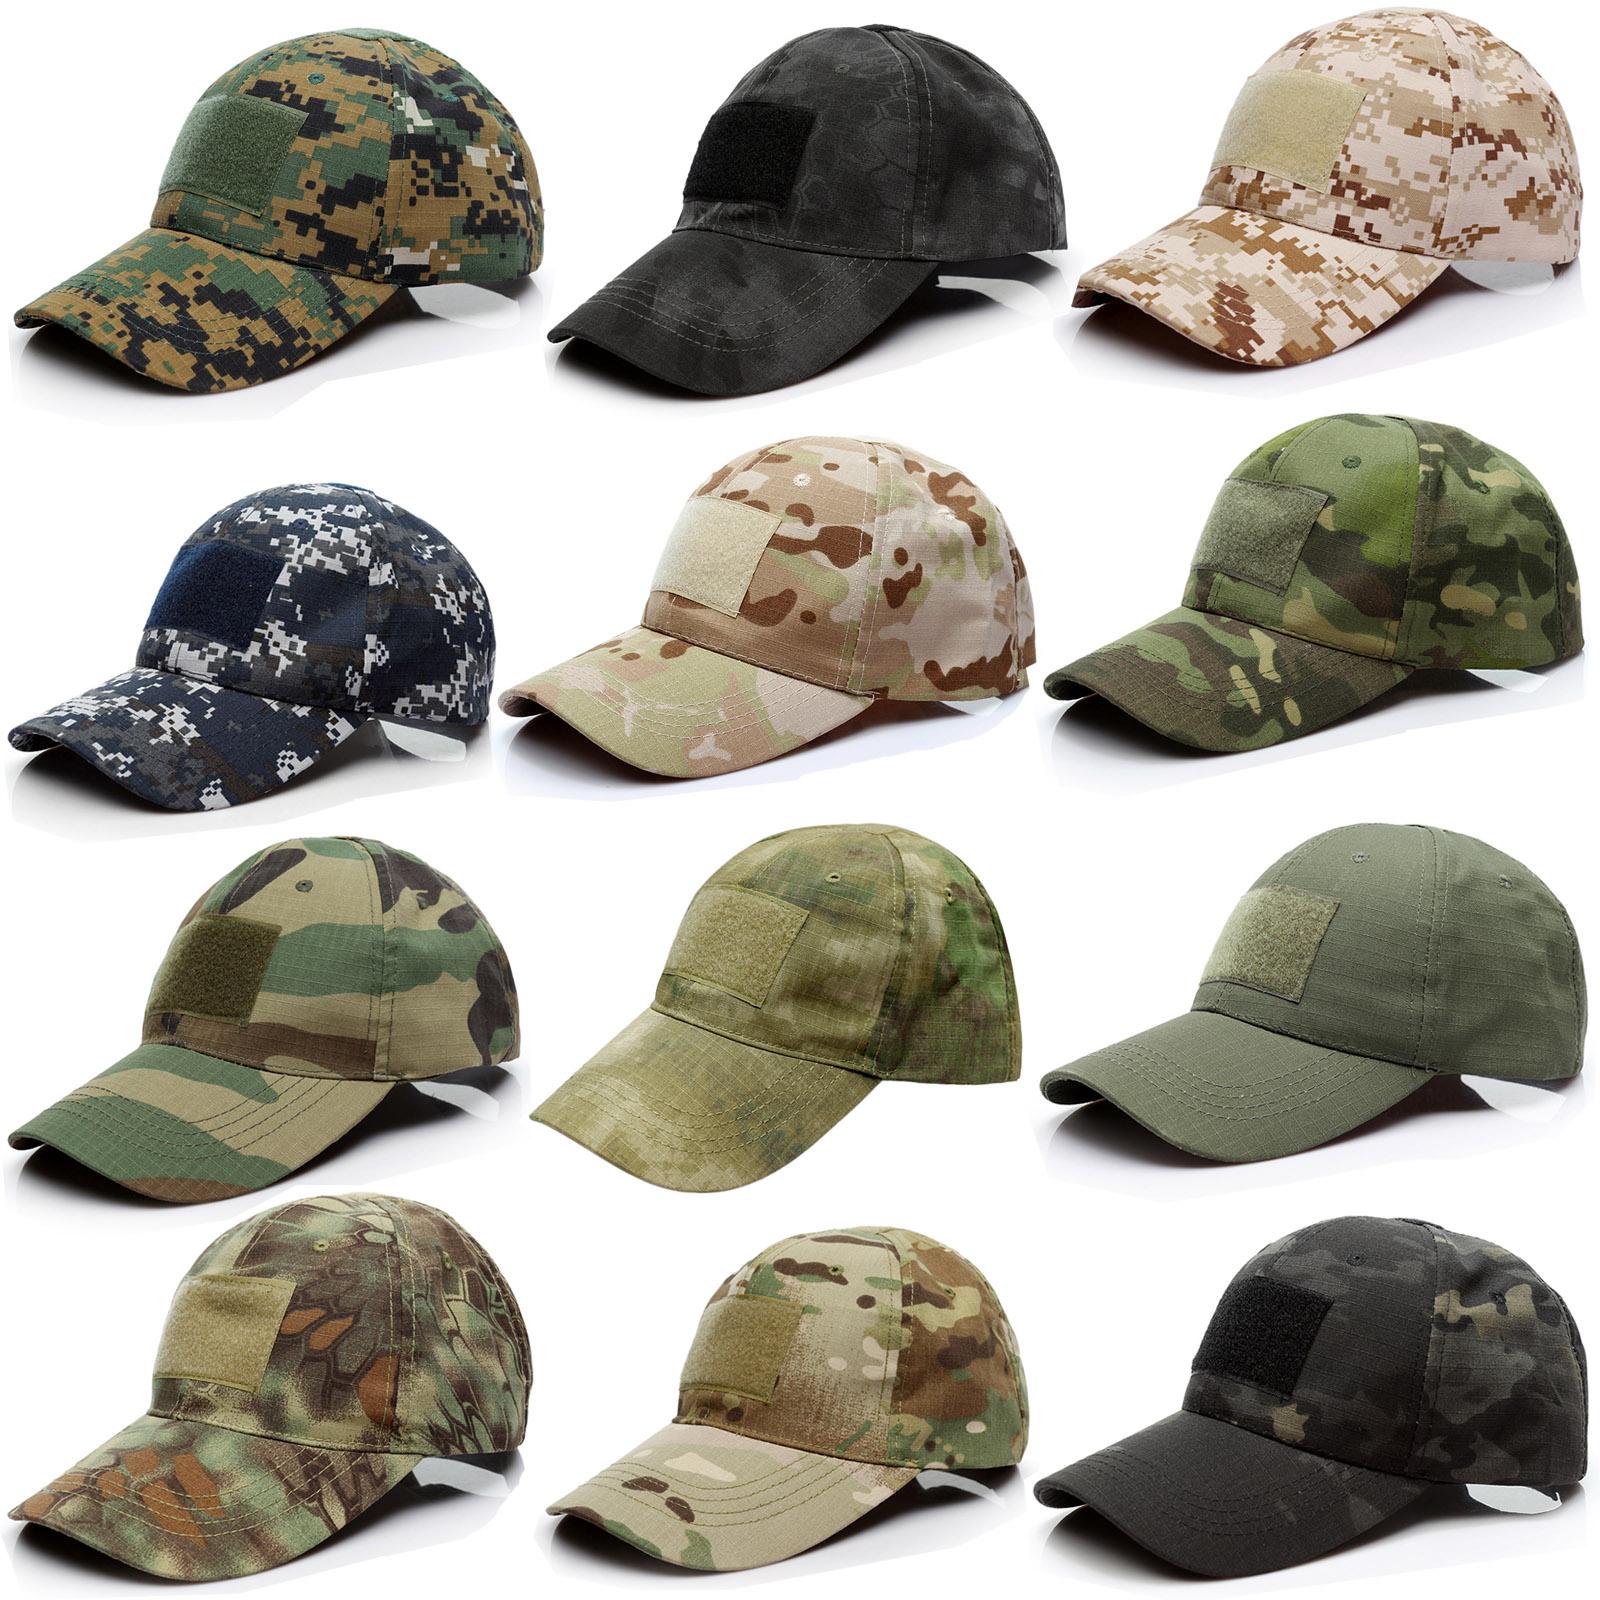 Army Military Operators Baseball Cap Adjustable UV Protection Outdoor Cap